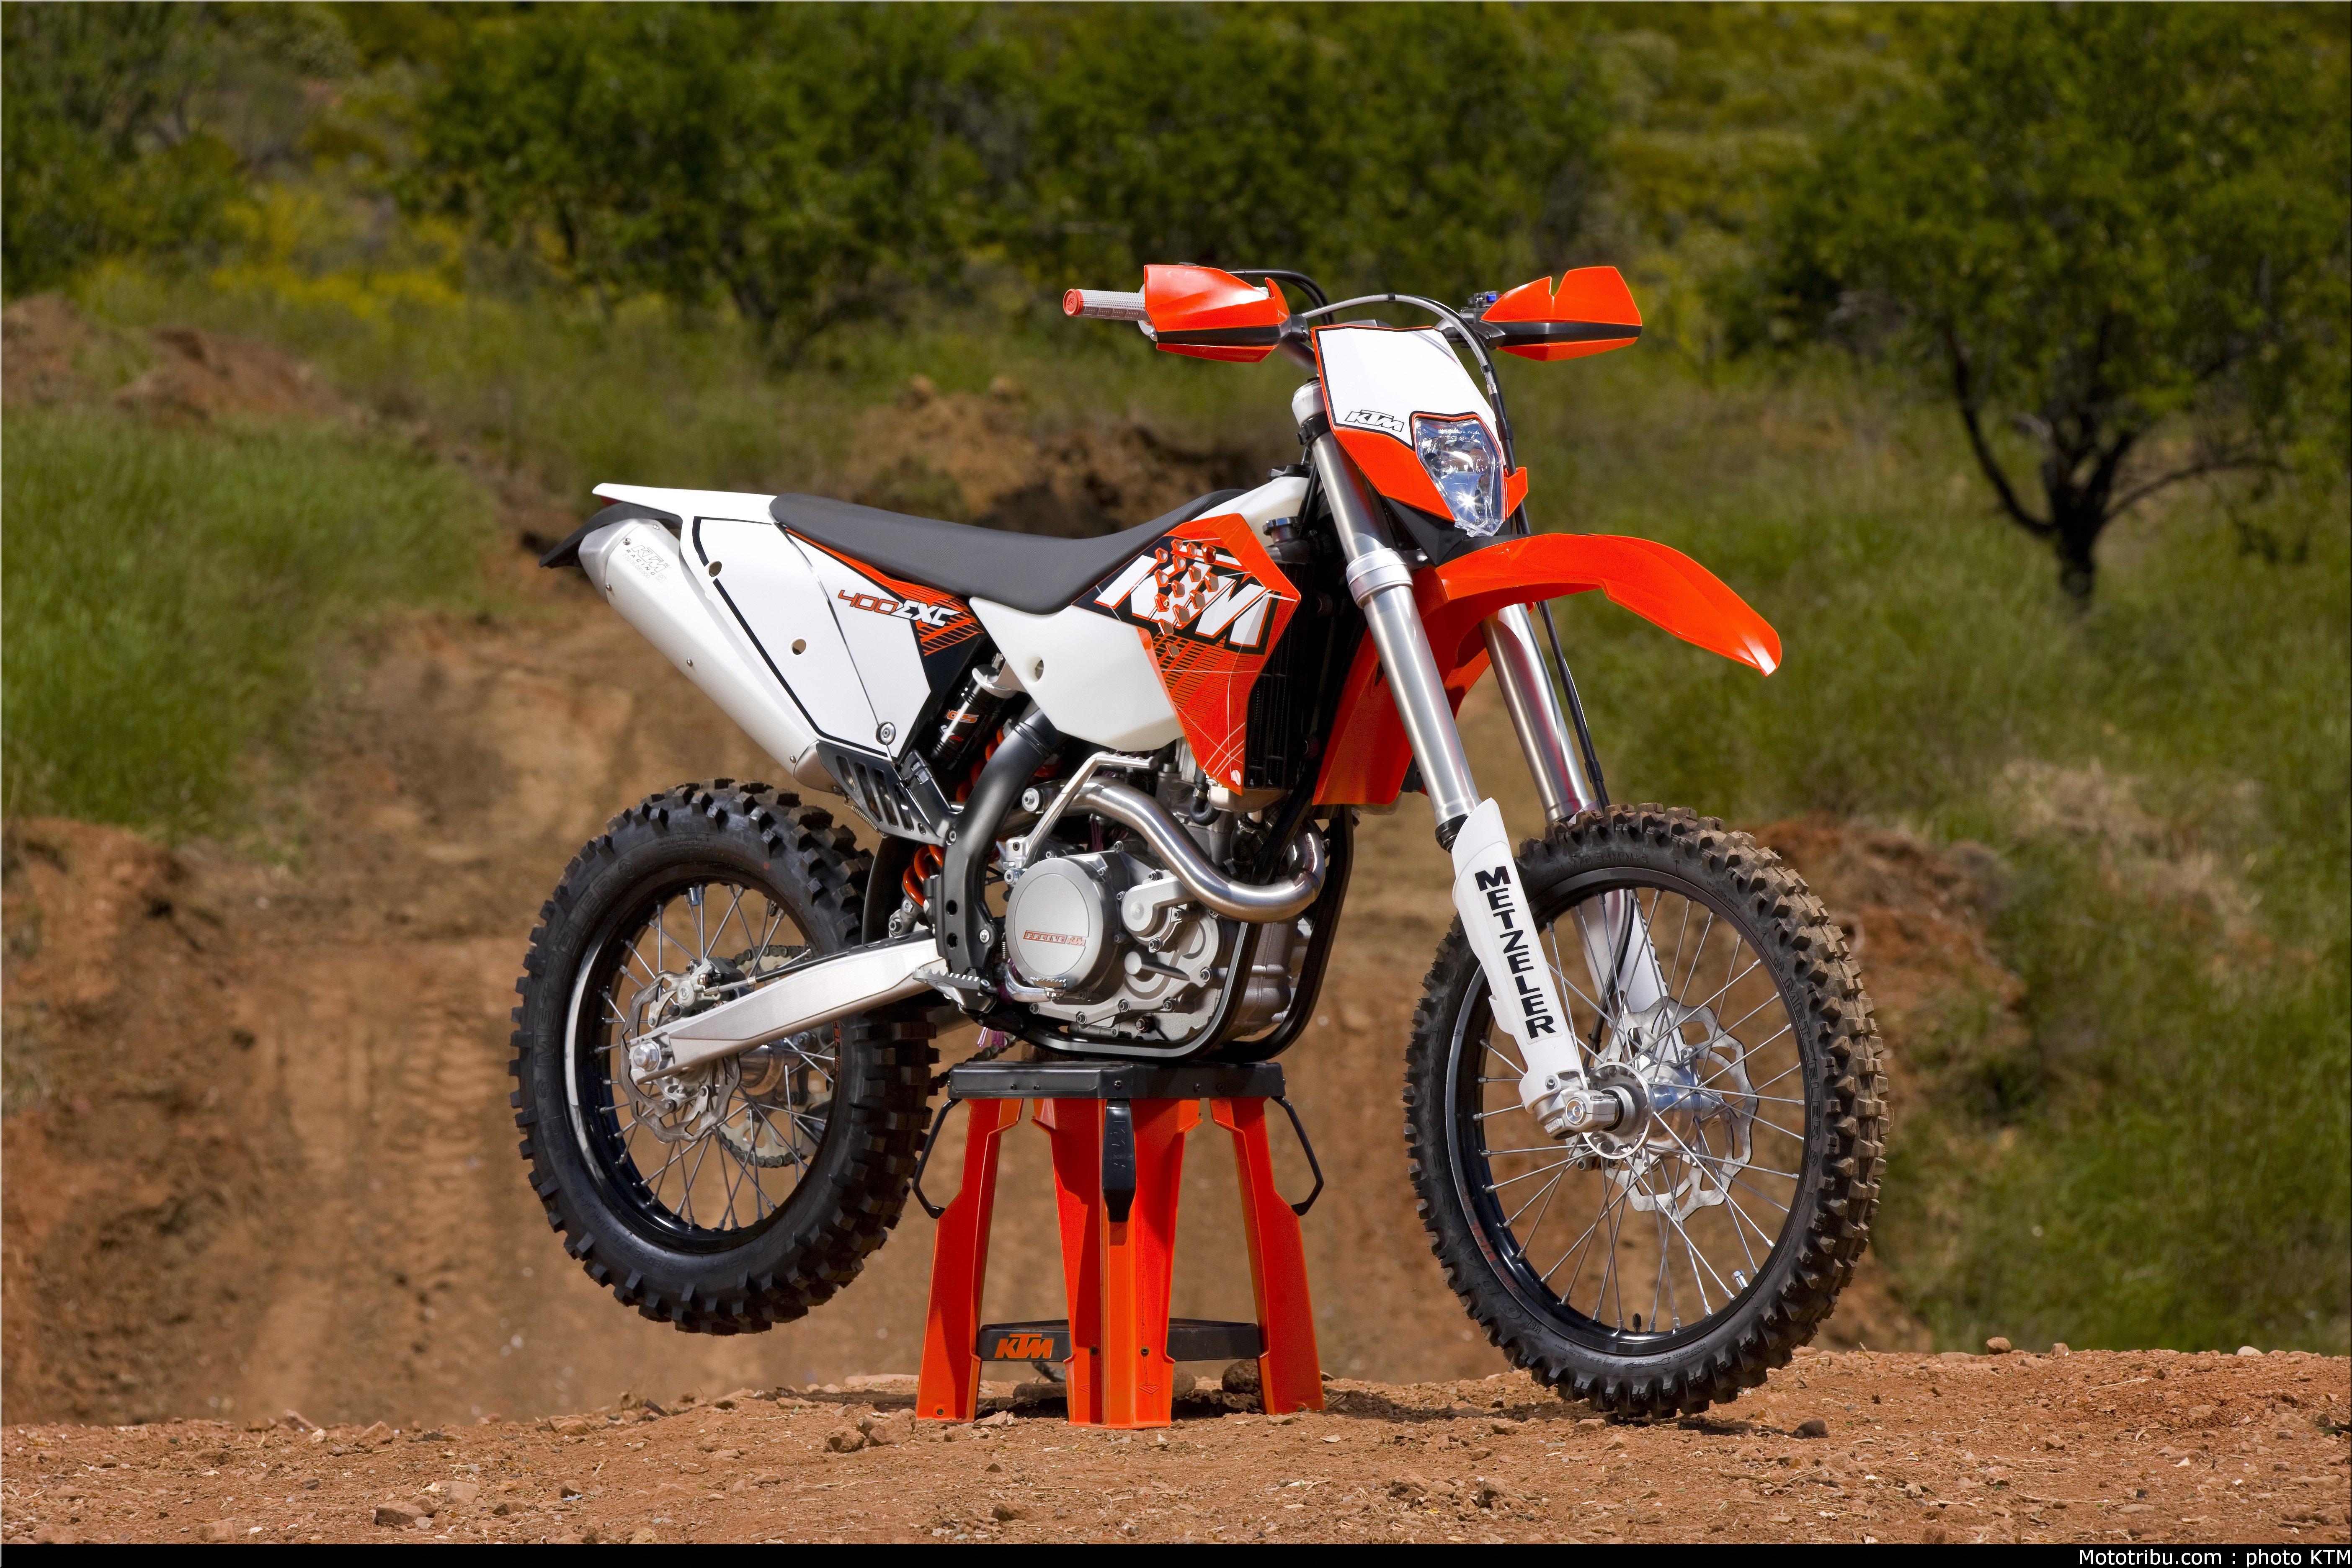 Nok en maskin i garasjen - 2011 KTM 400 EXC  Ktm-400-exc-2011-3